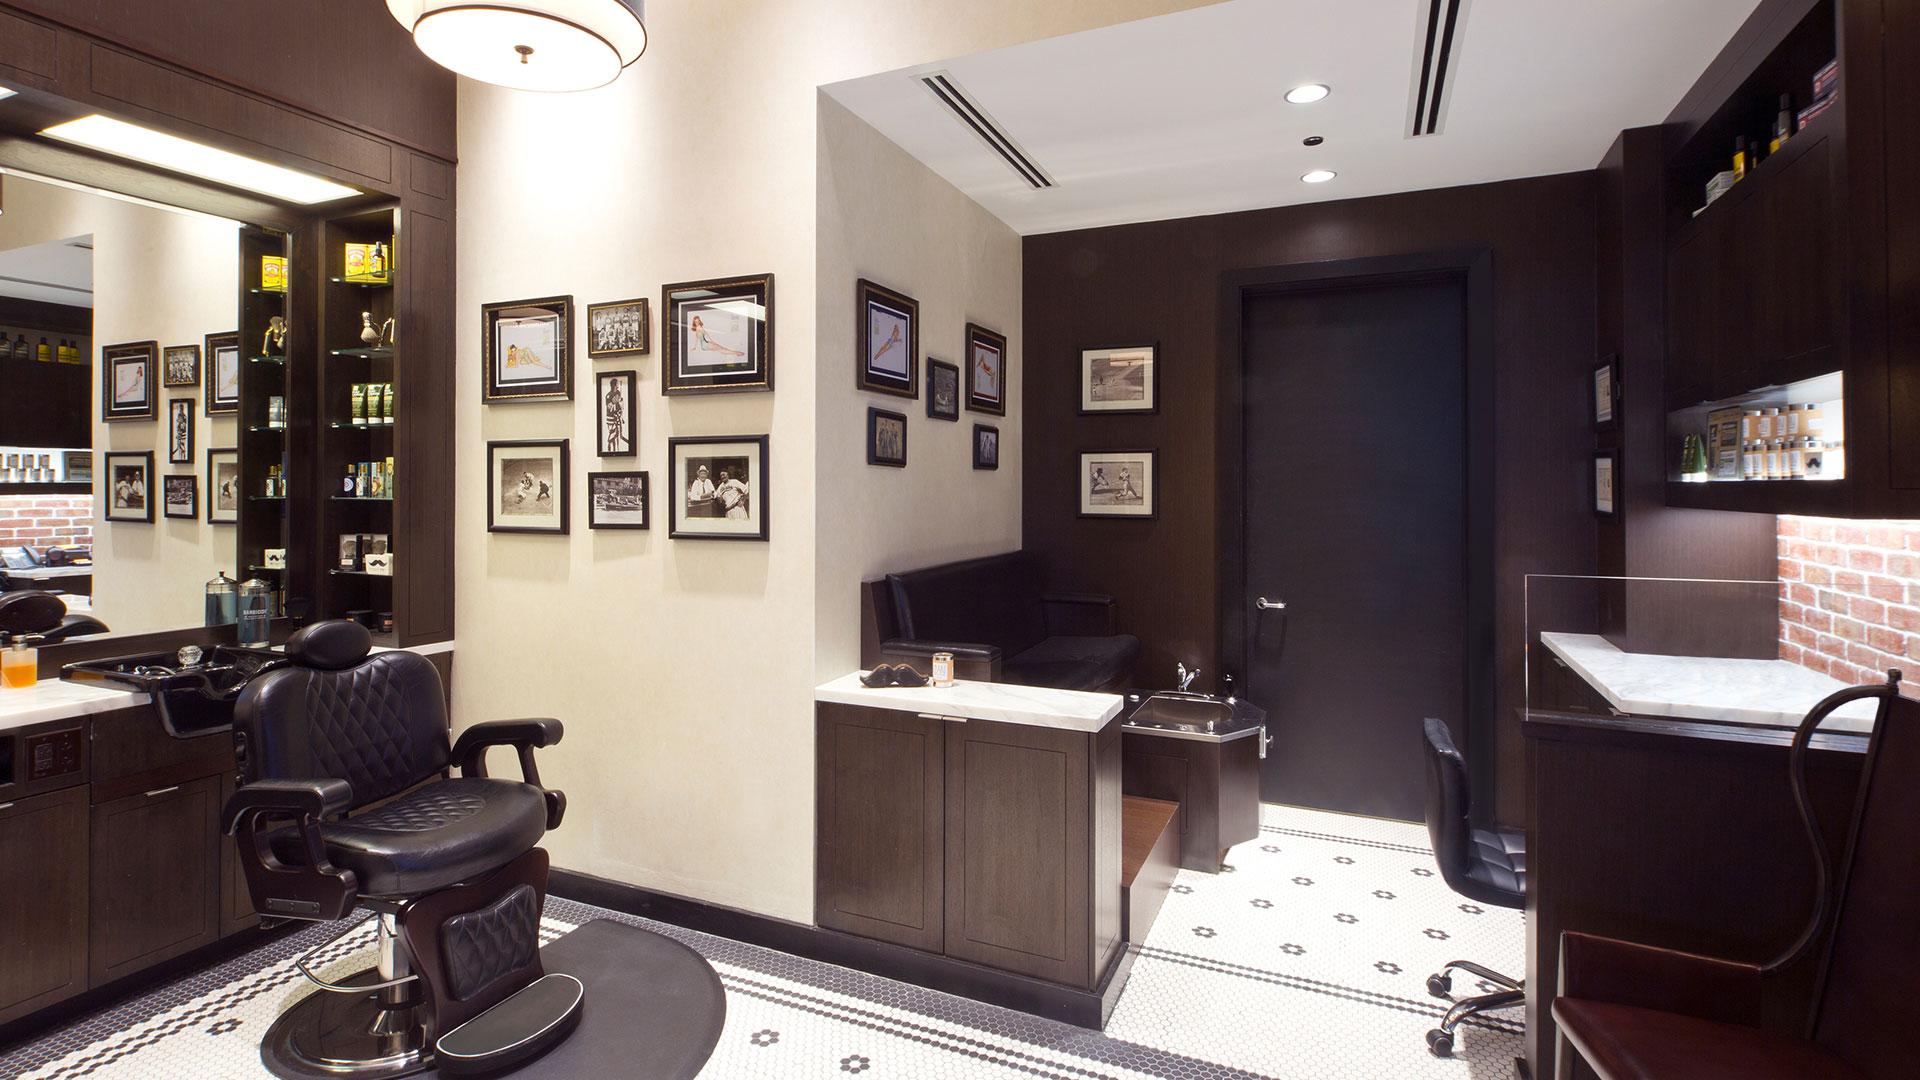 Commercial Retail Design Golden Nugget Lake Charles Landry's Hair Salon Barber shop